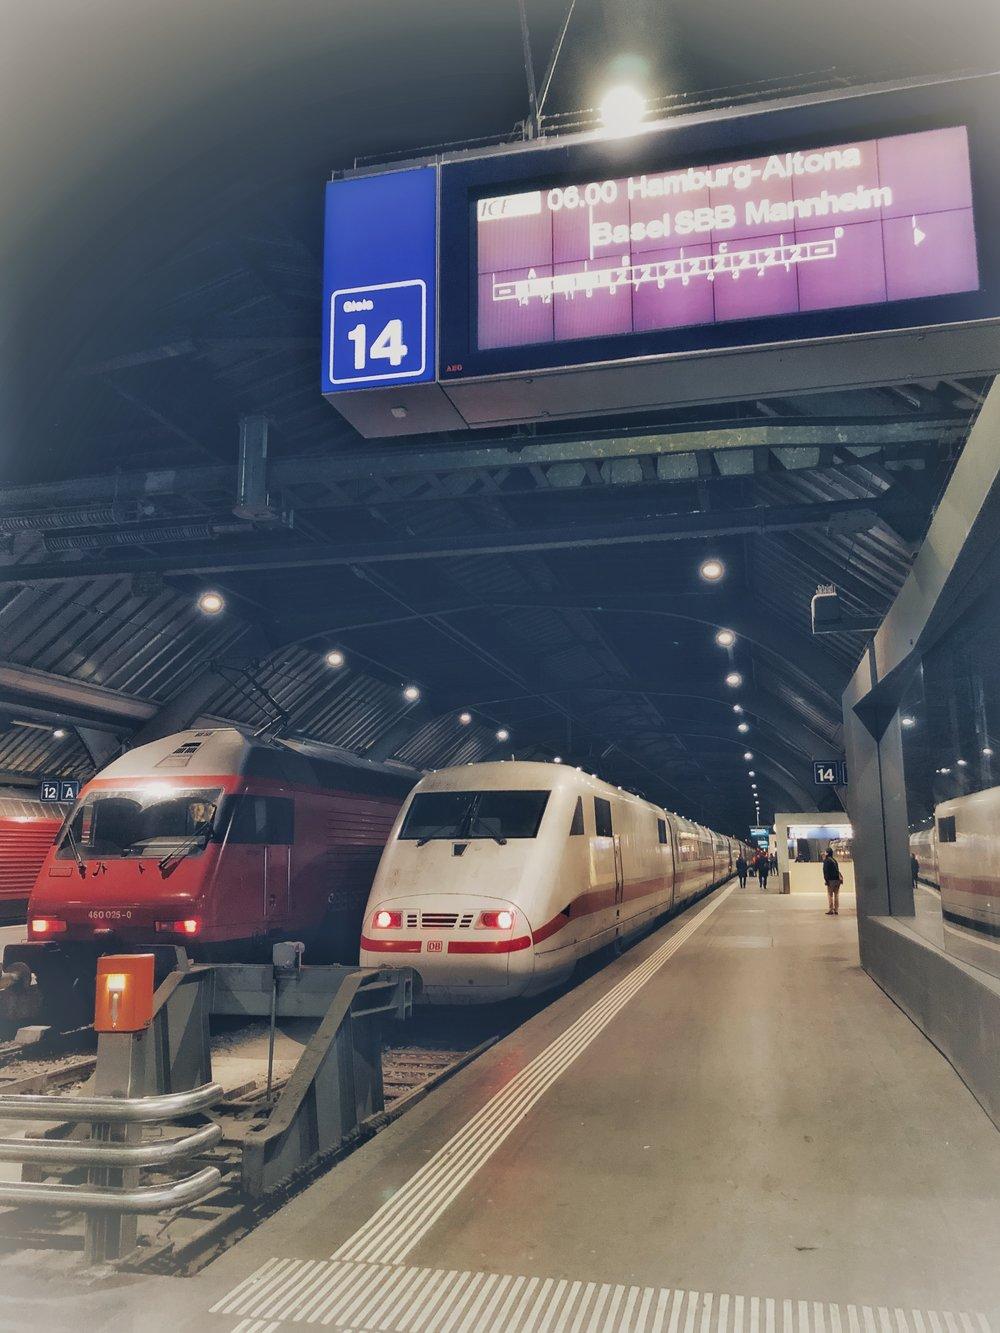 0600 Zurich Mainstation — an empty refreshing trainstation